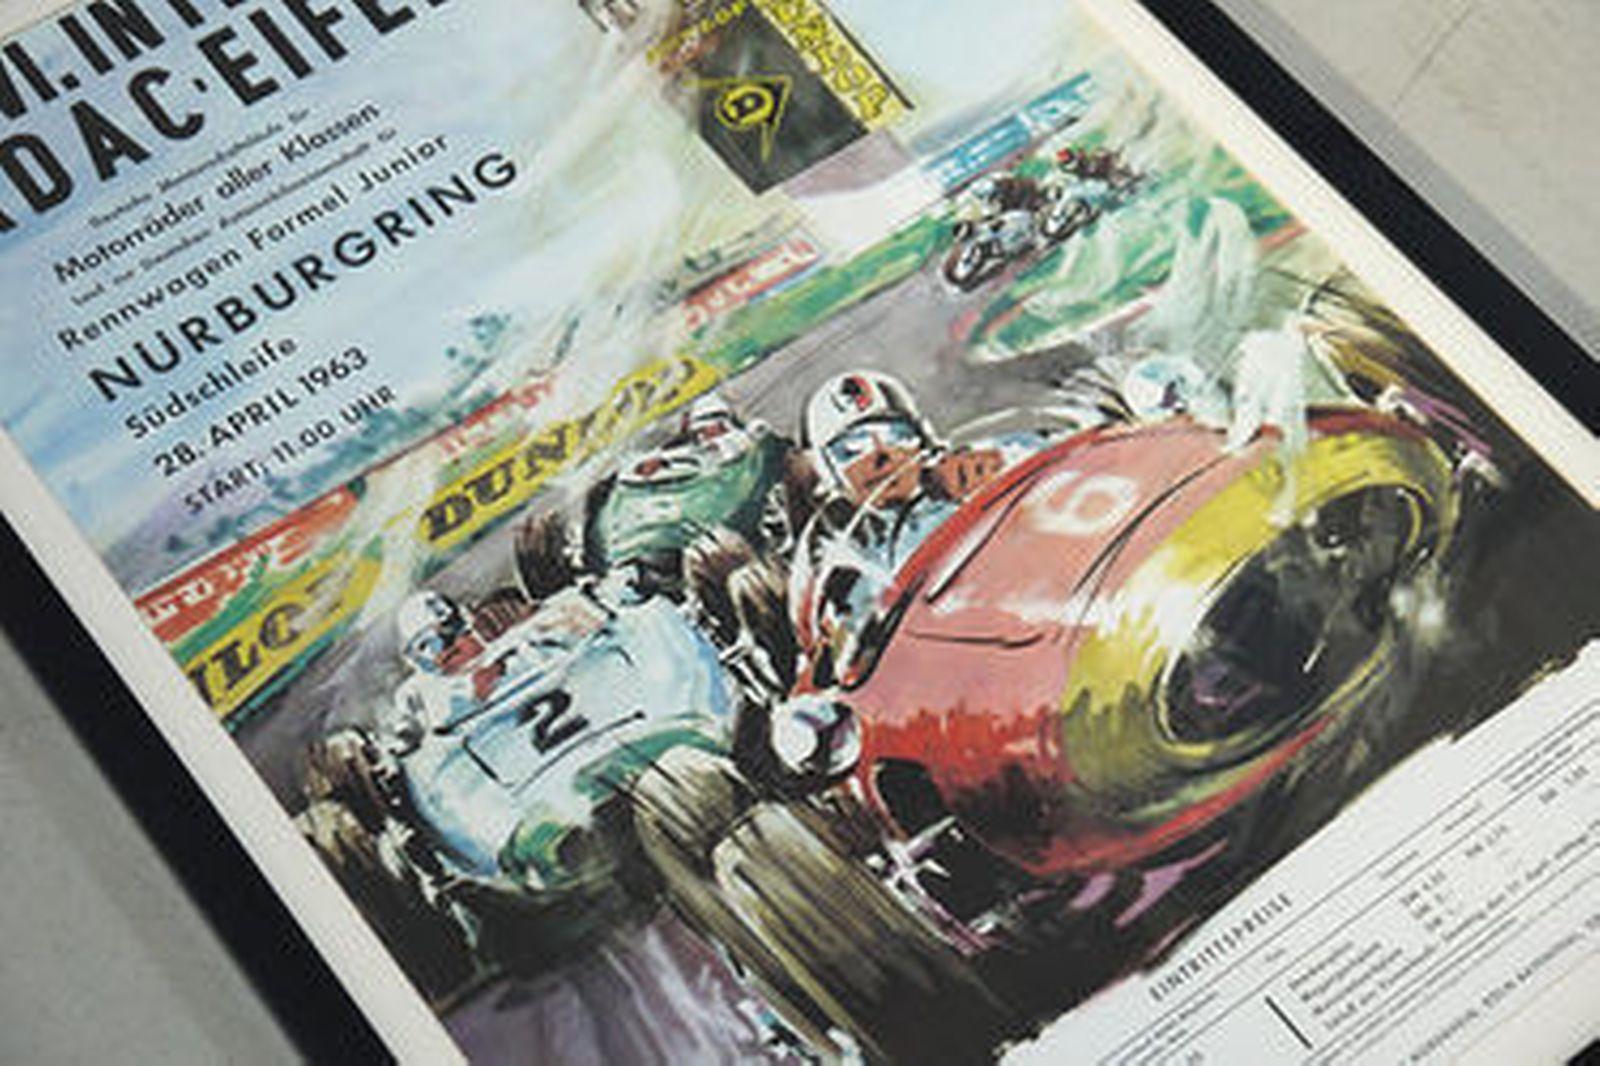 Framed Print - XXVI International ADAC Eifel Race - 28 April 1963 'Nurburgring' (95 x 68cm)